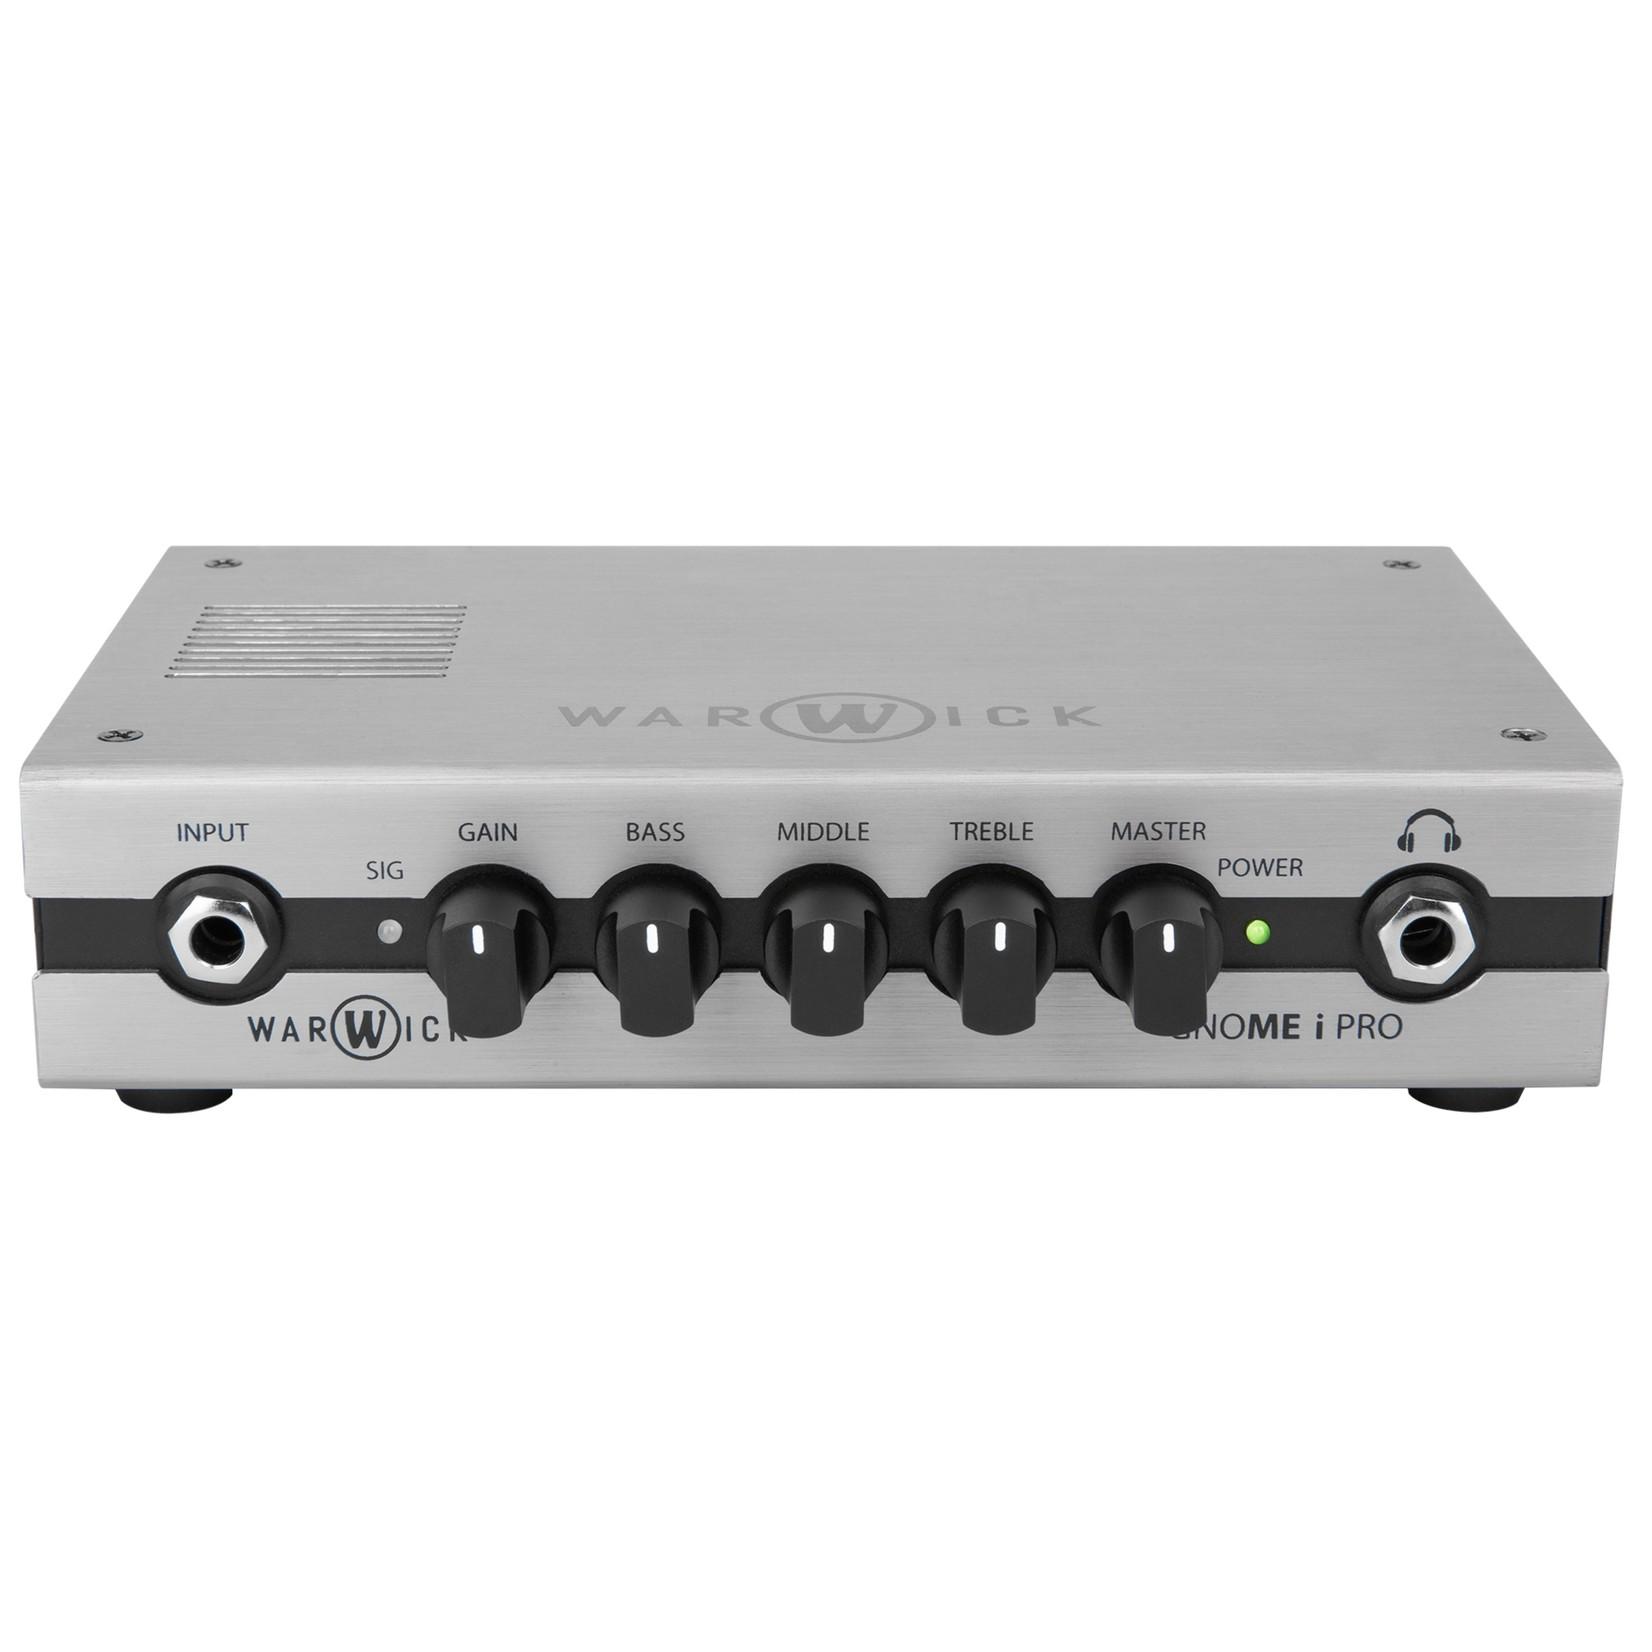 Warwick Warwick Gnome i Pro - Pocket Bass Amp Head with USB Interface, 280 Watt